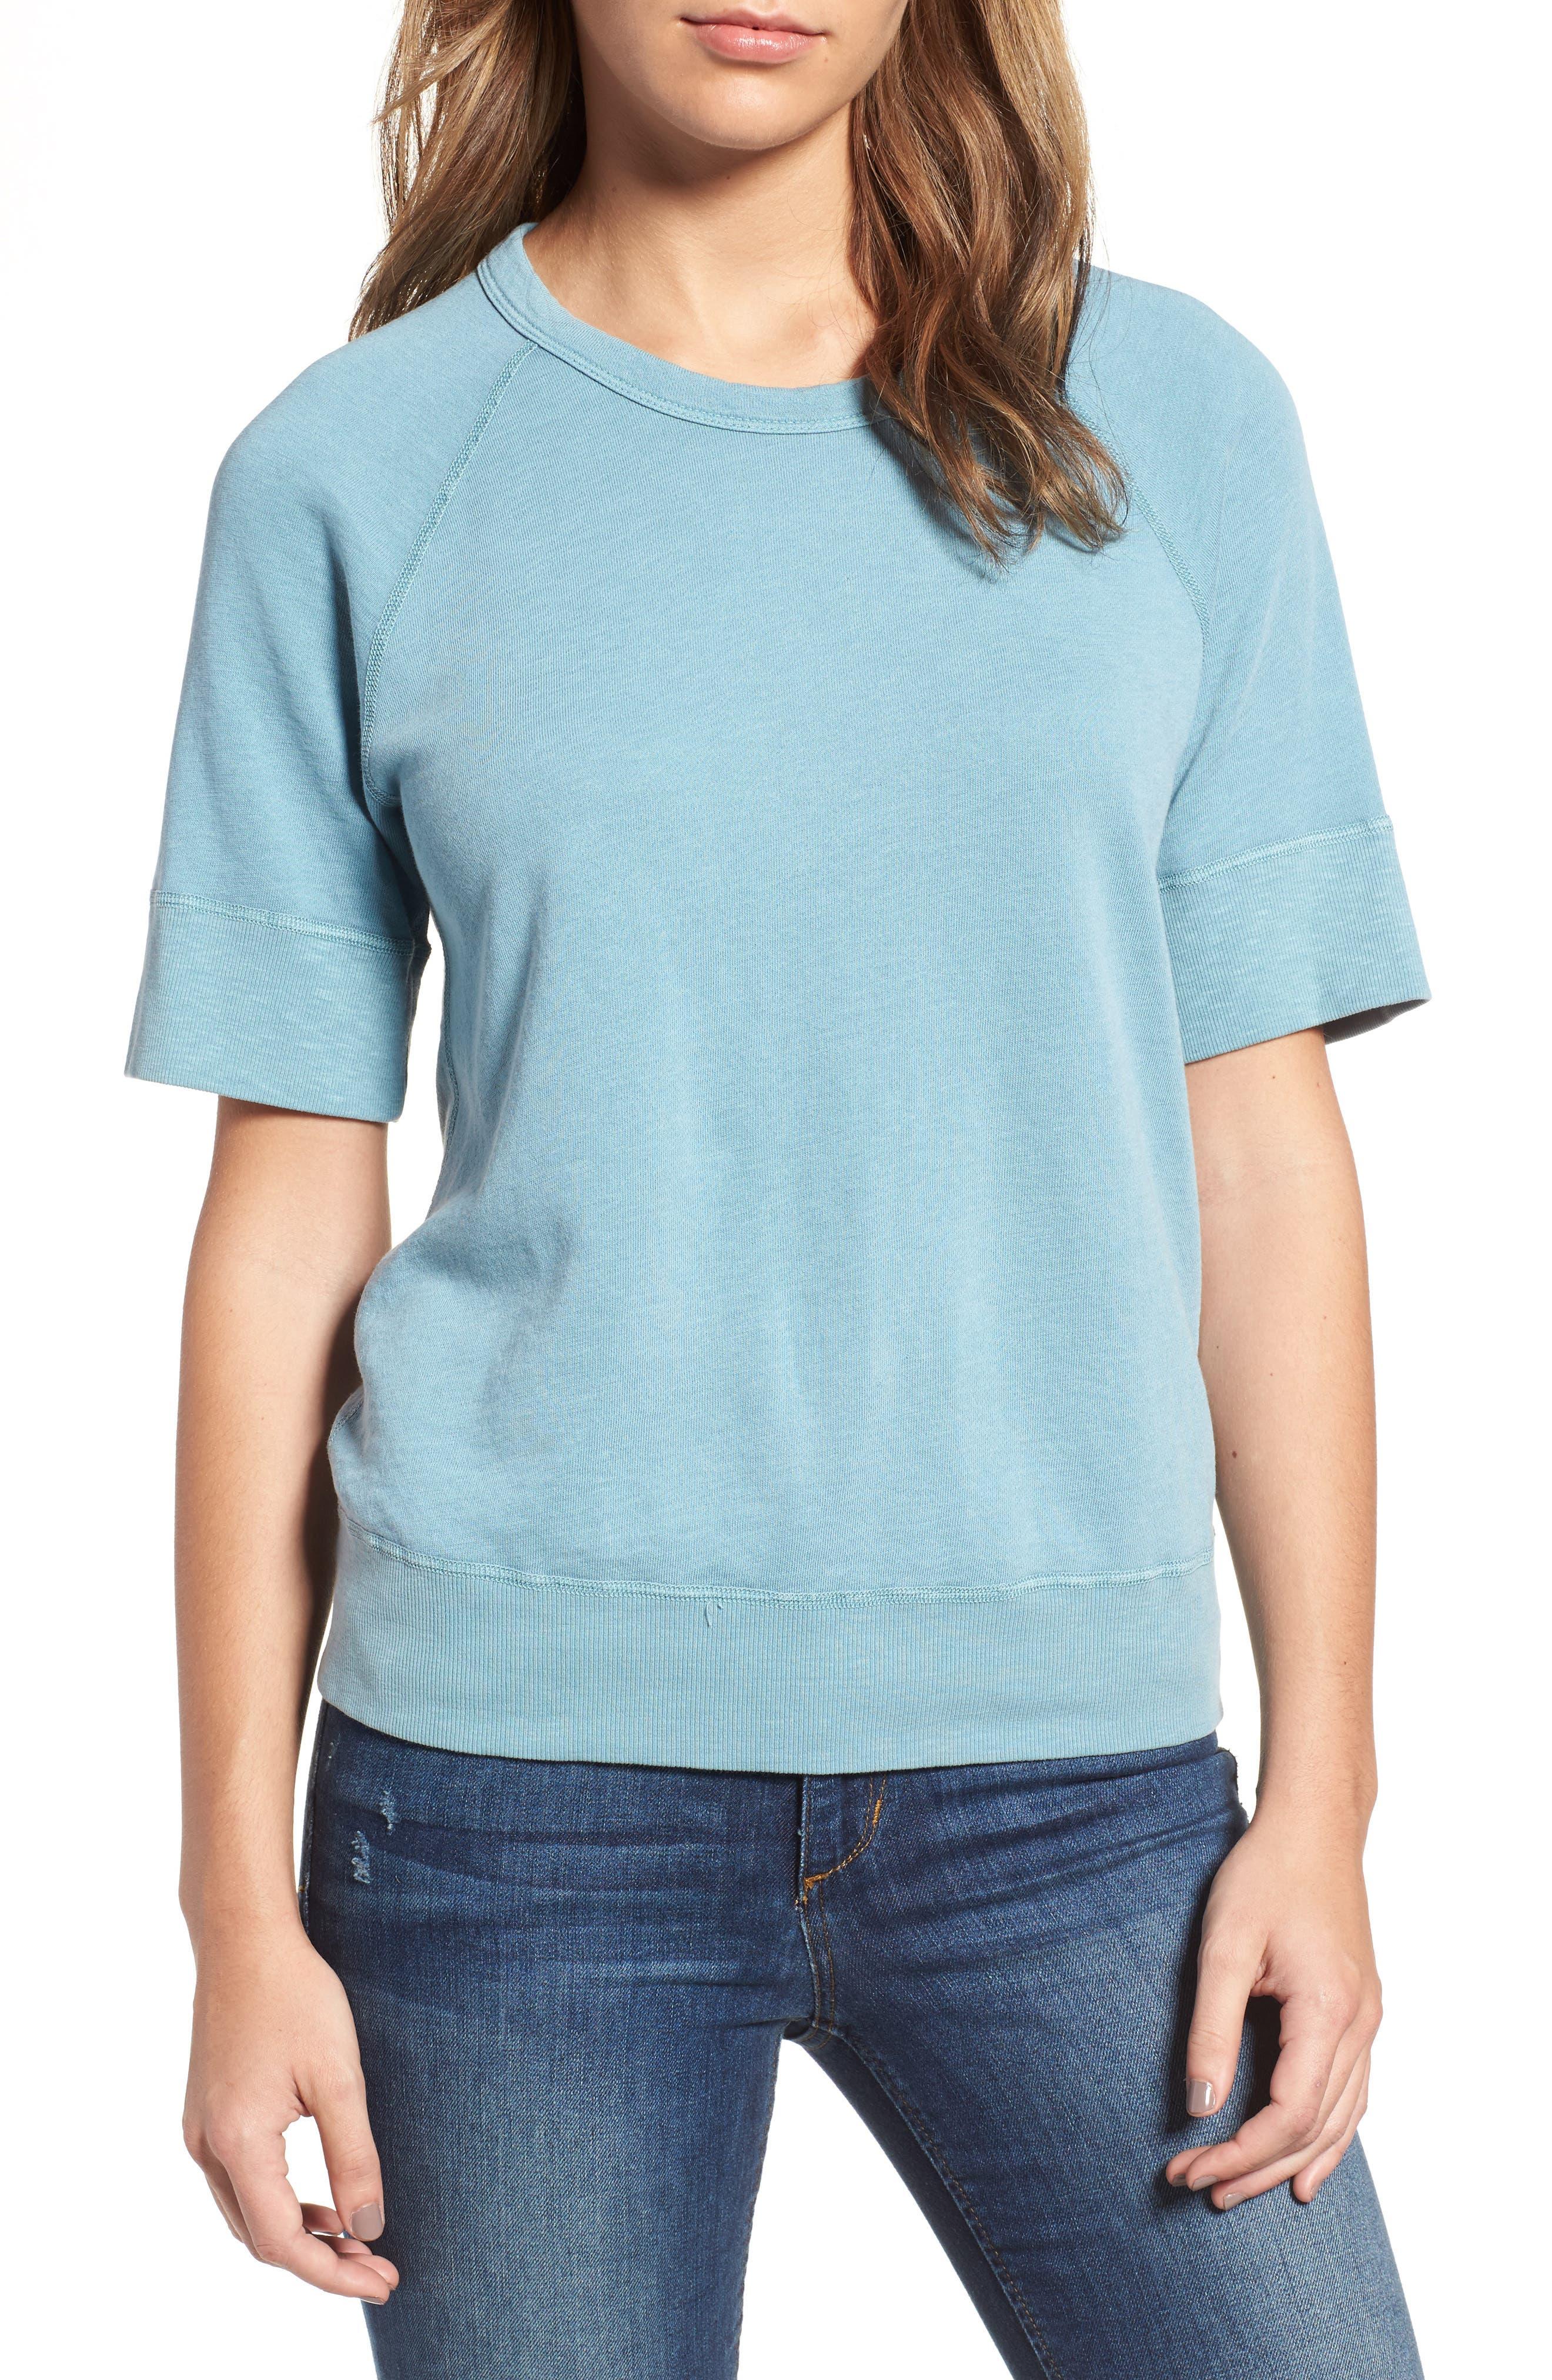 Alternate Image 1 Selected - James Perse Raglan Sleeve Cotton Pullover